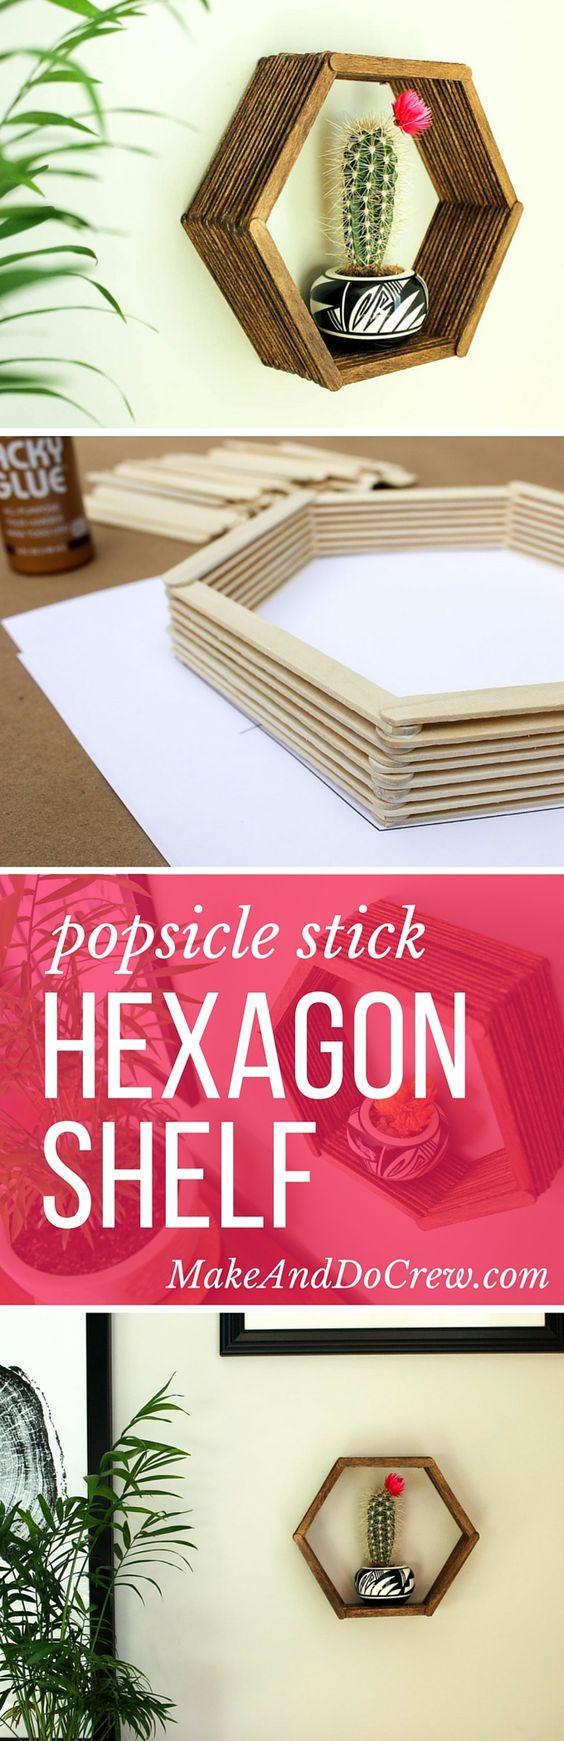 Popsicle Stick Hexagon Shelf.